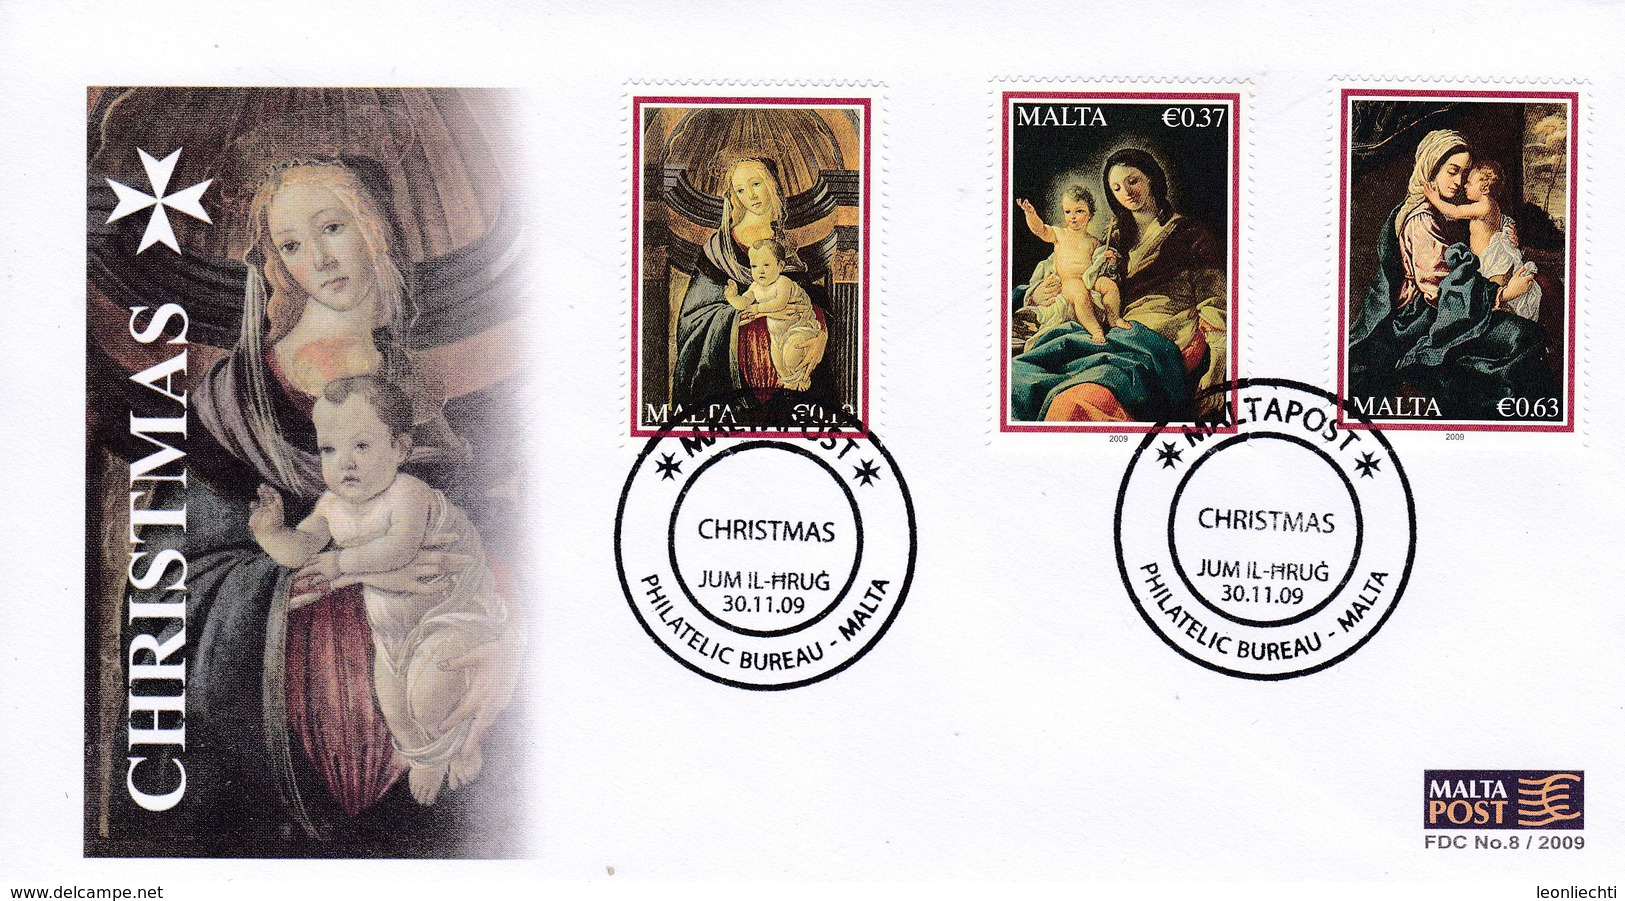 Malta, FDC N°. 8 . 30.11.09. Christmas - Christianisme